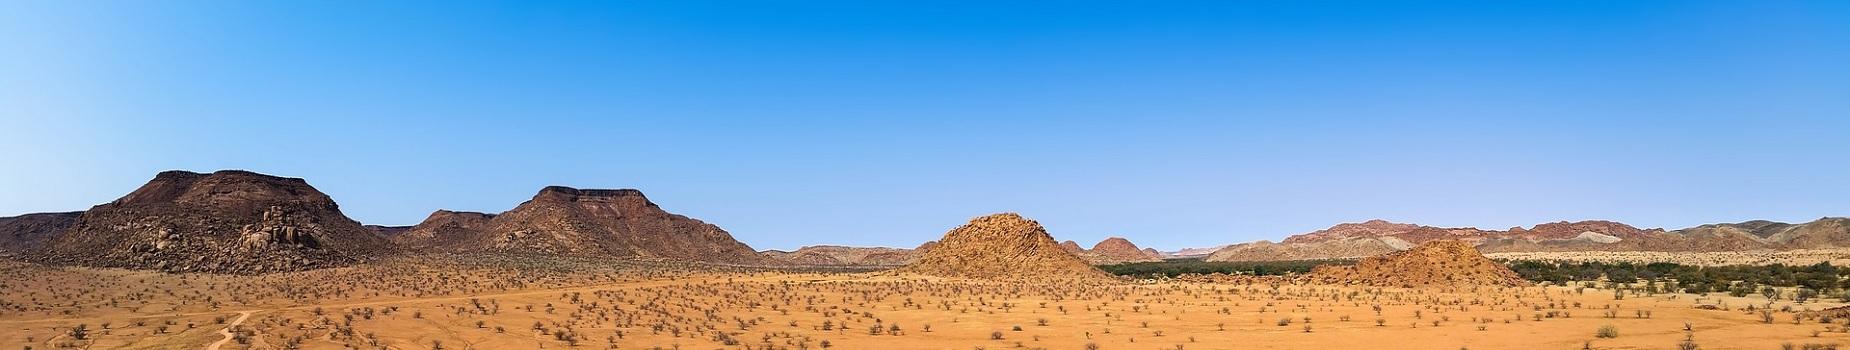 Vliegvelden Namibië